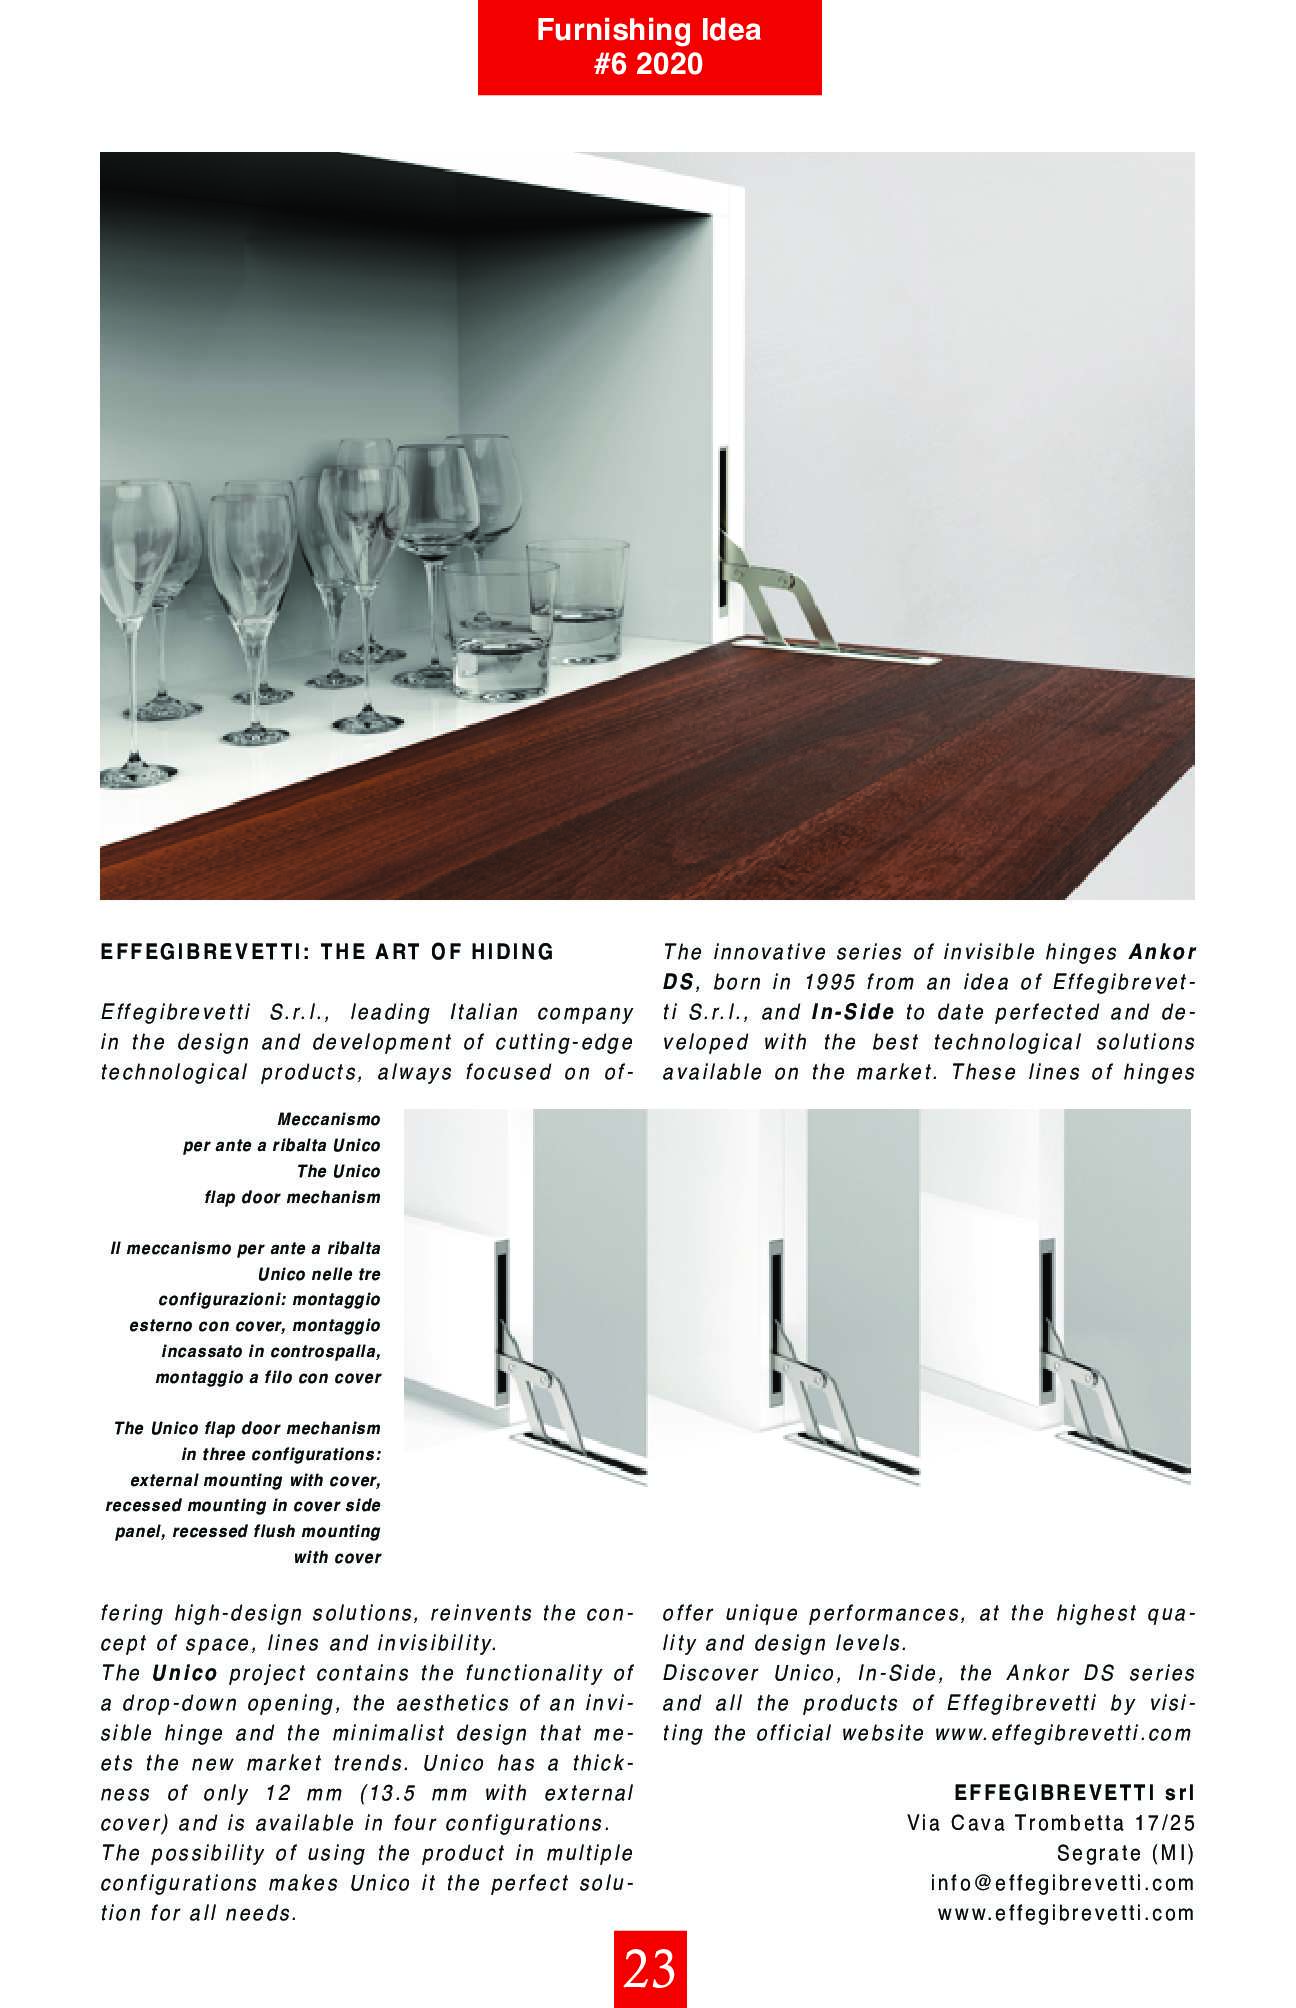 furnishingidea-6-2020_journal_22_022.jpg